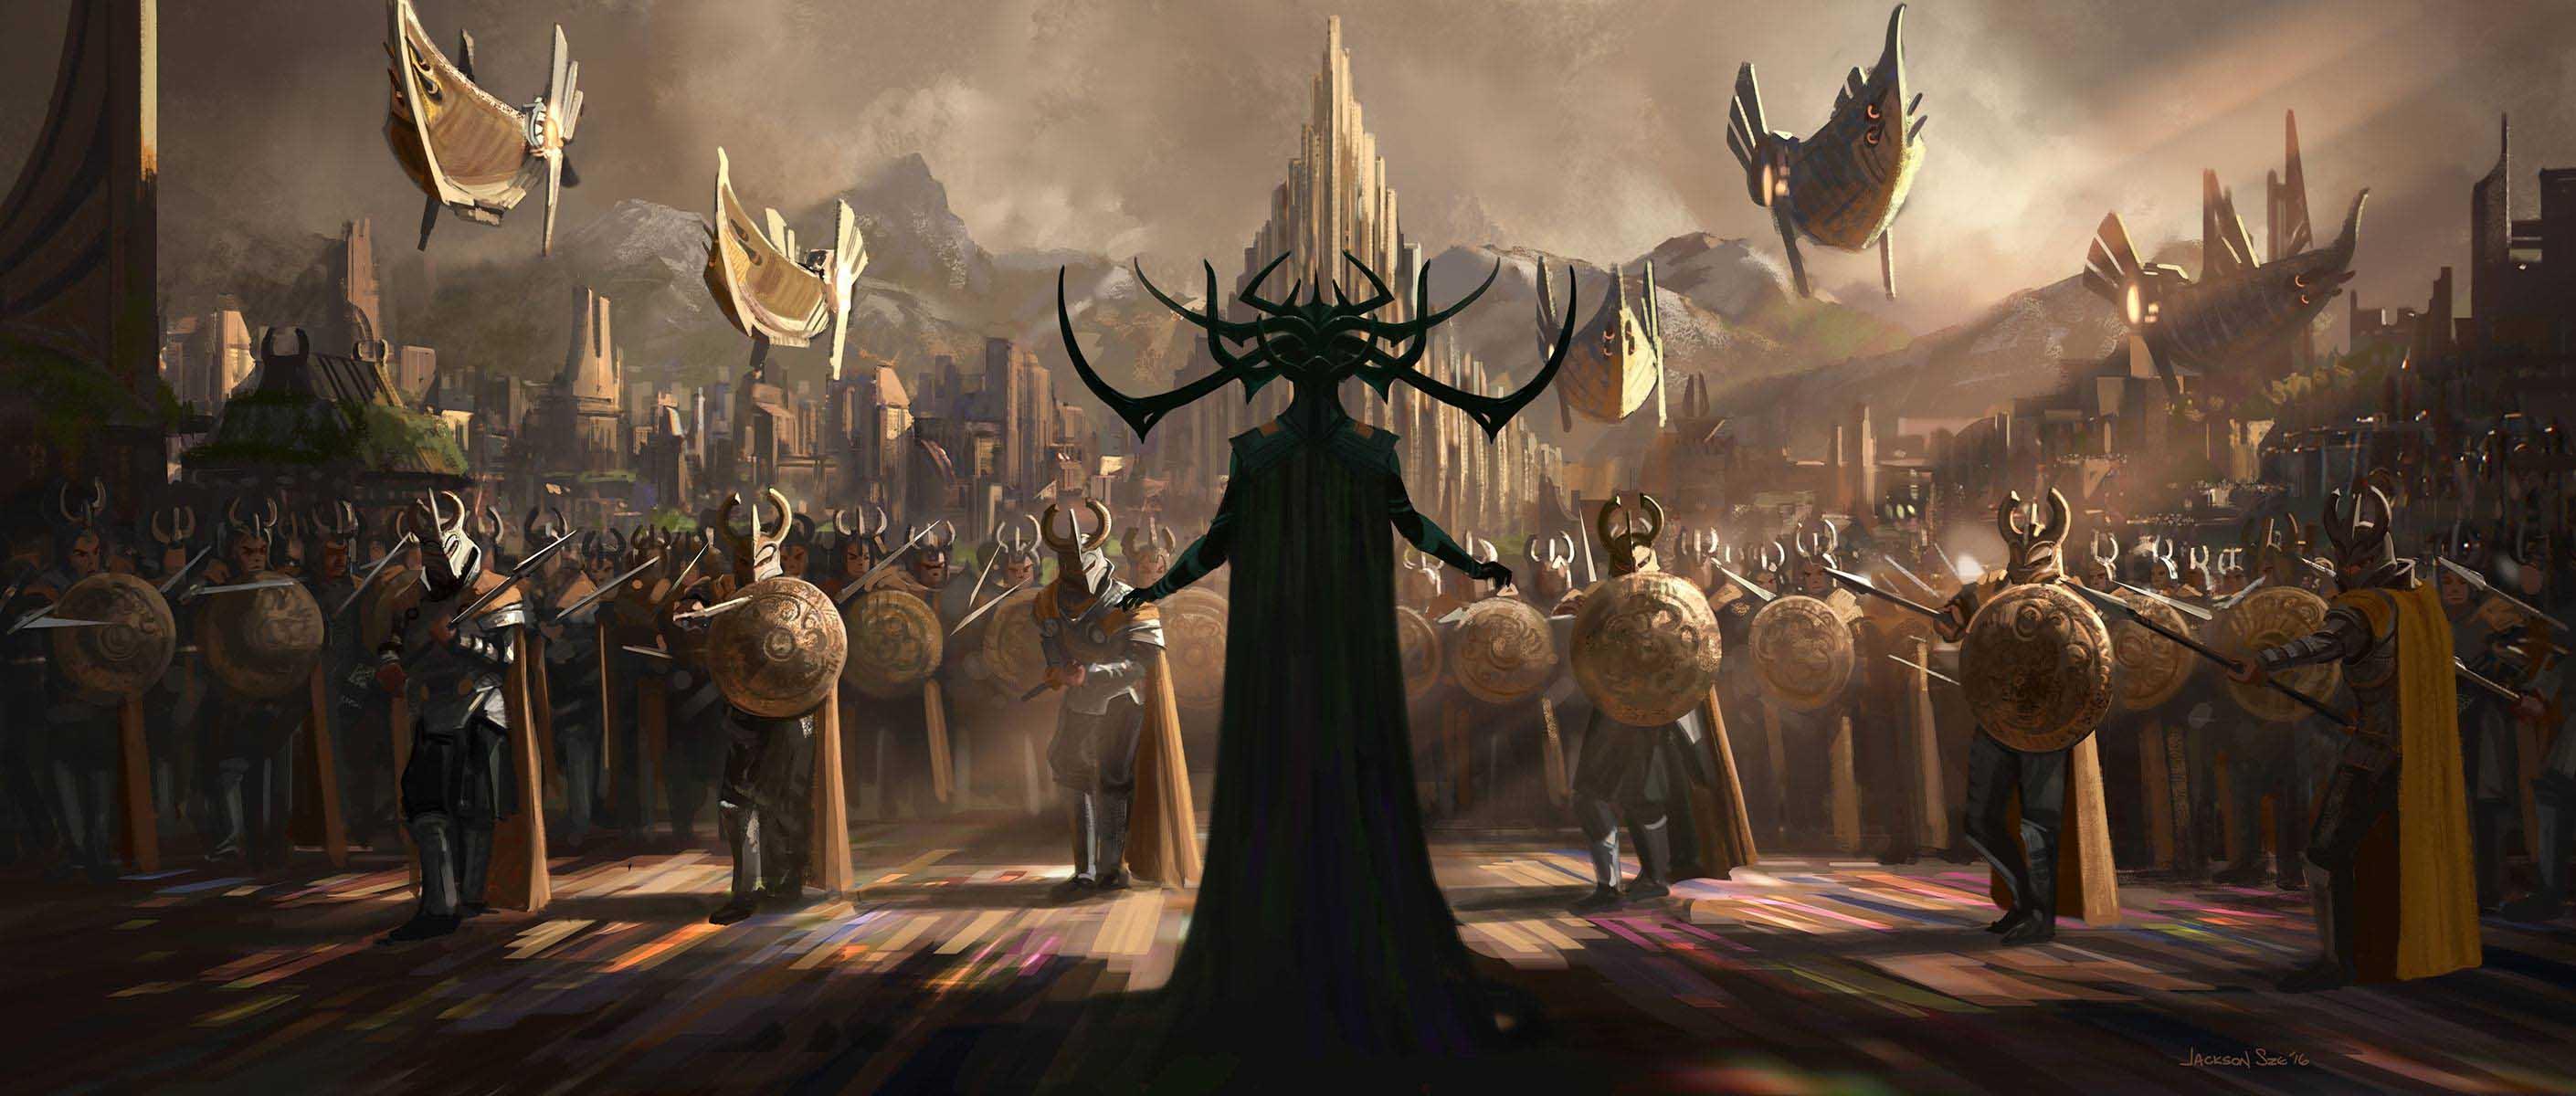 Concept Art Thor Ragnarok